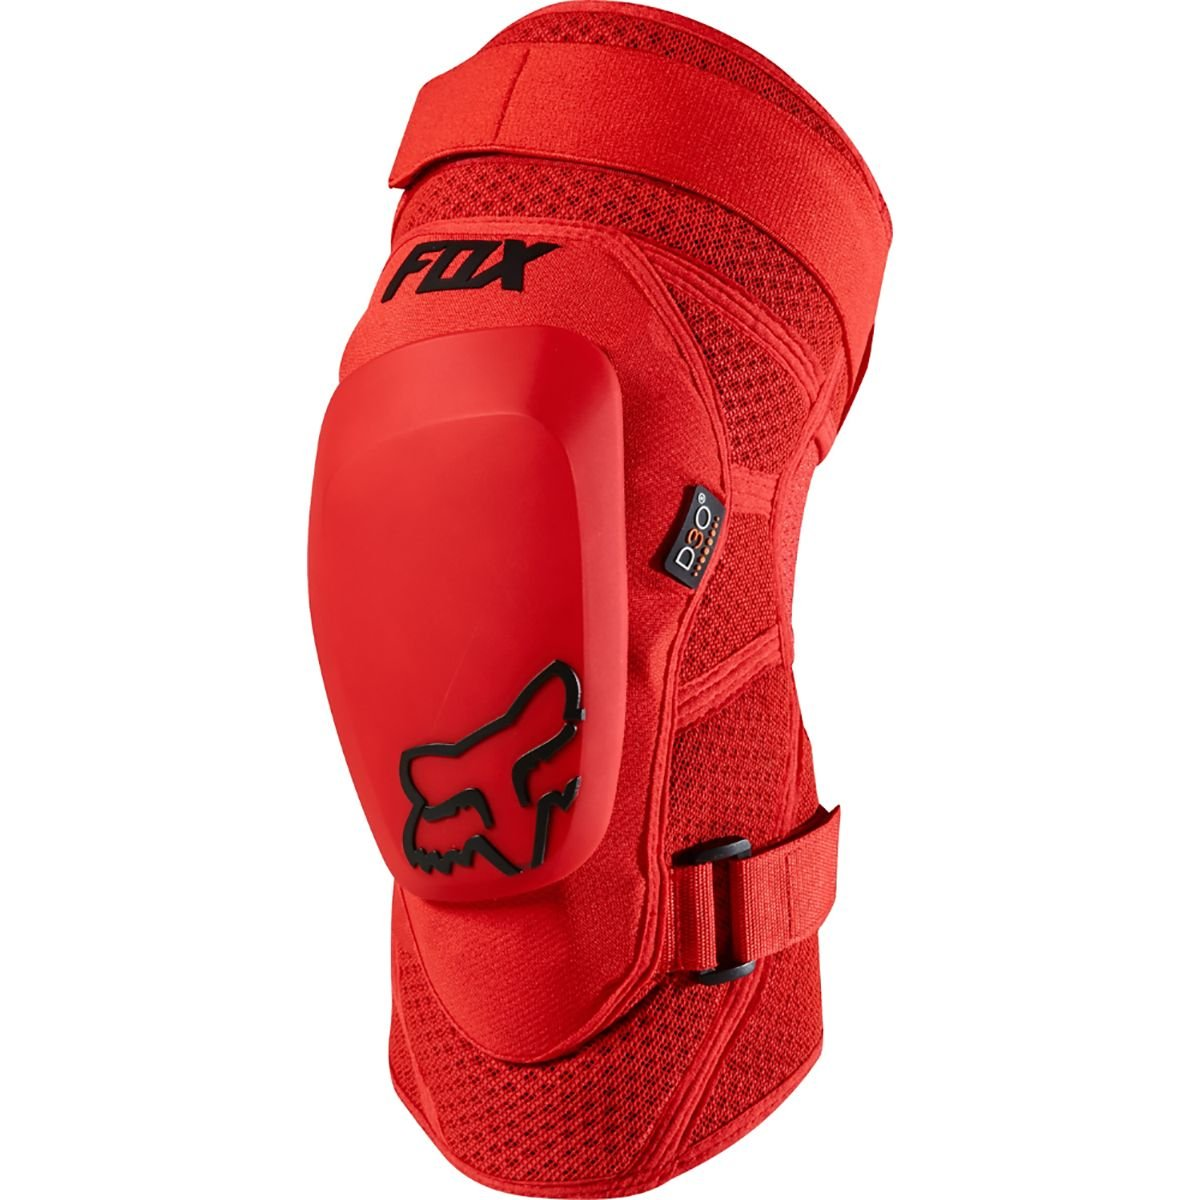 Fox Racing Launch Pro D3O Knee Guard Red, S